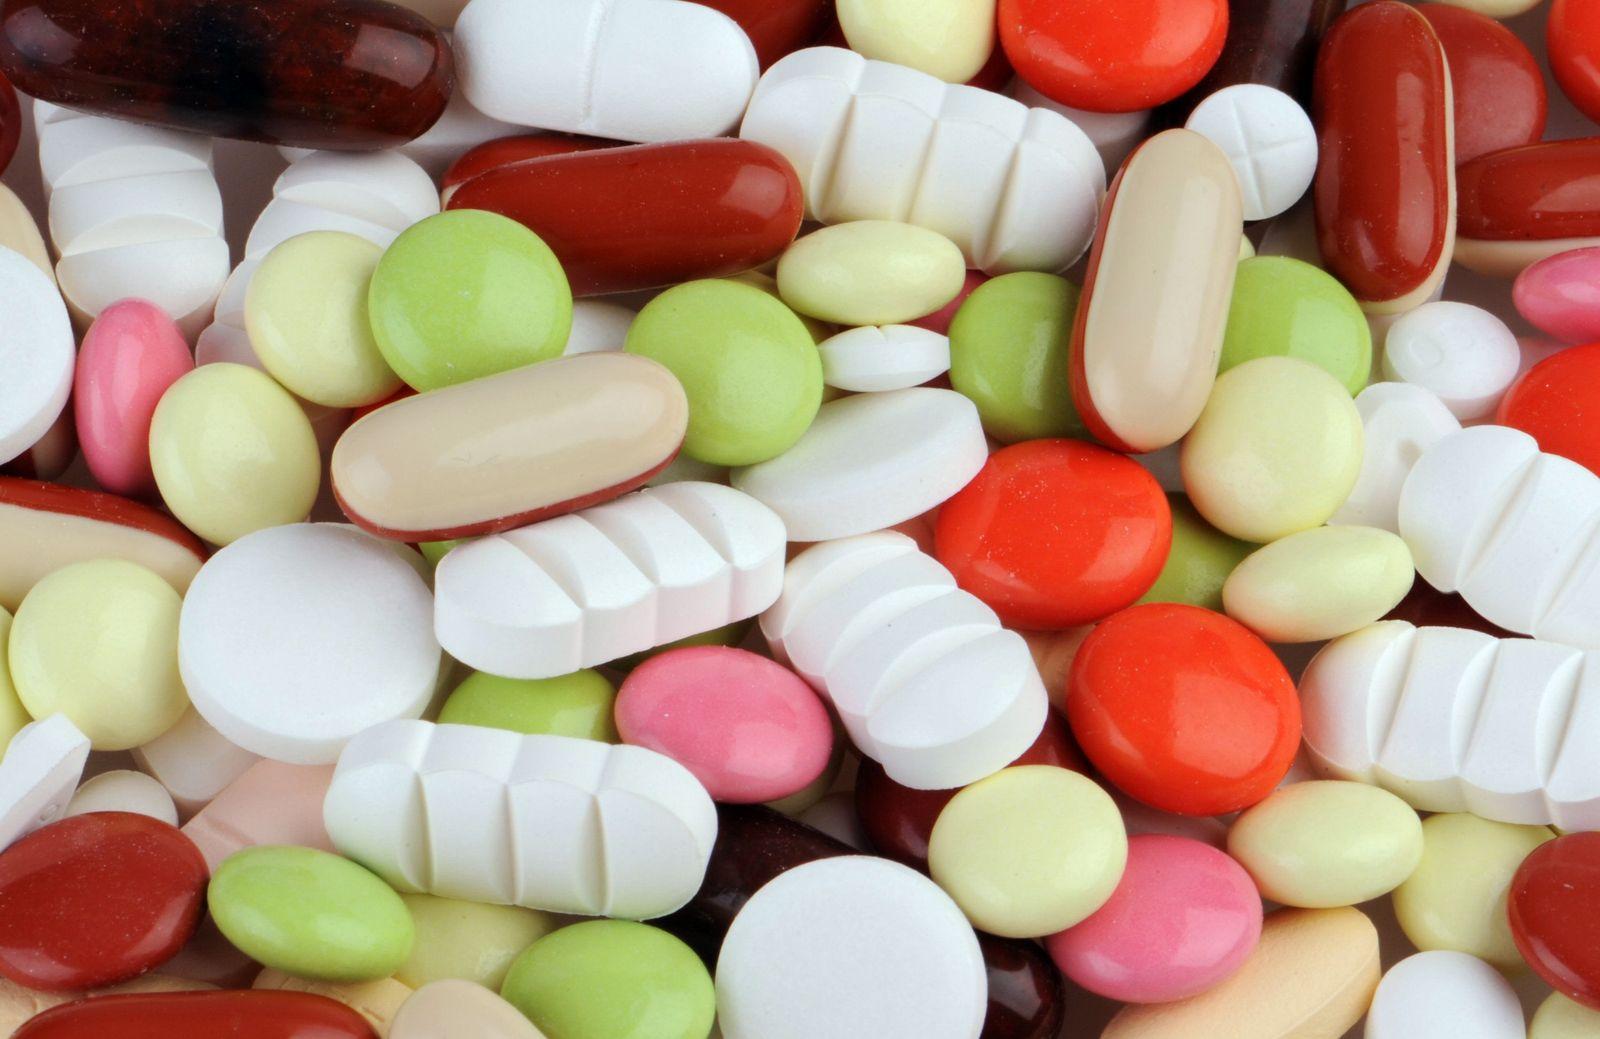 Arzneimittel / Medikamente /